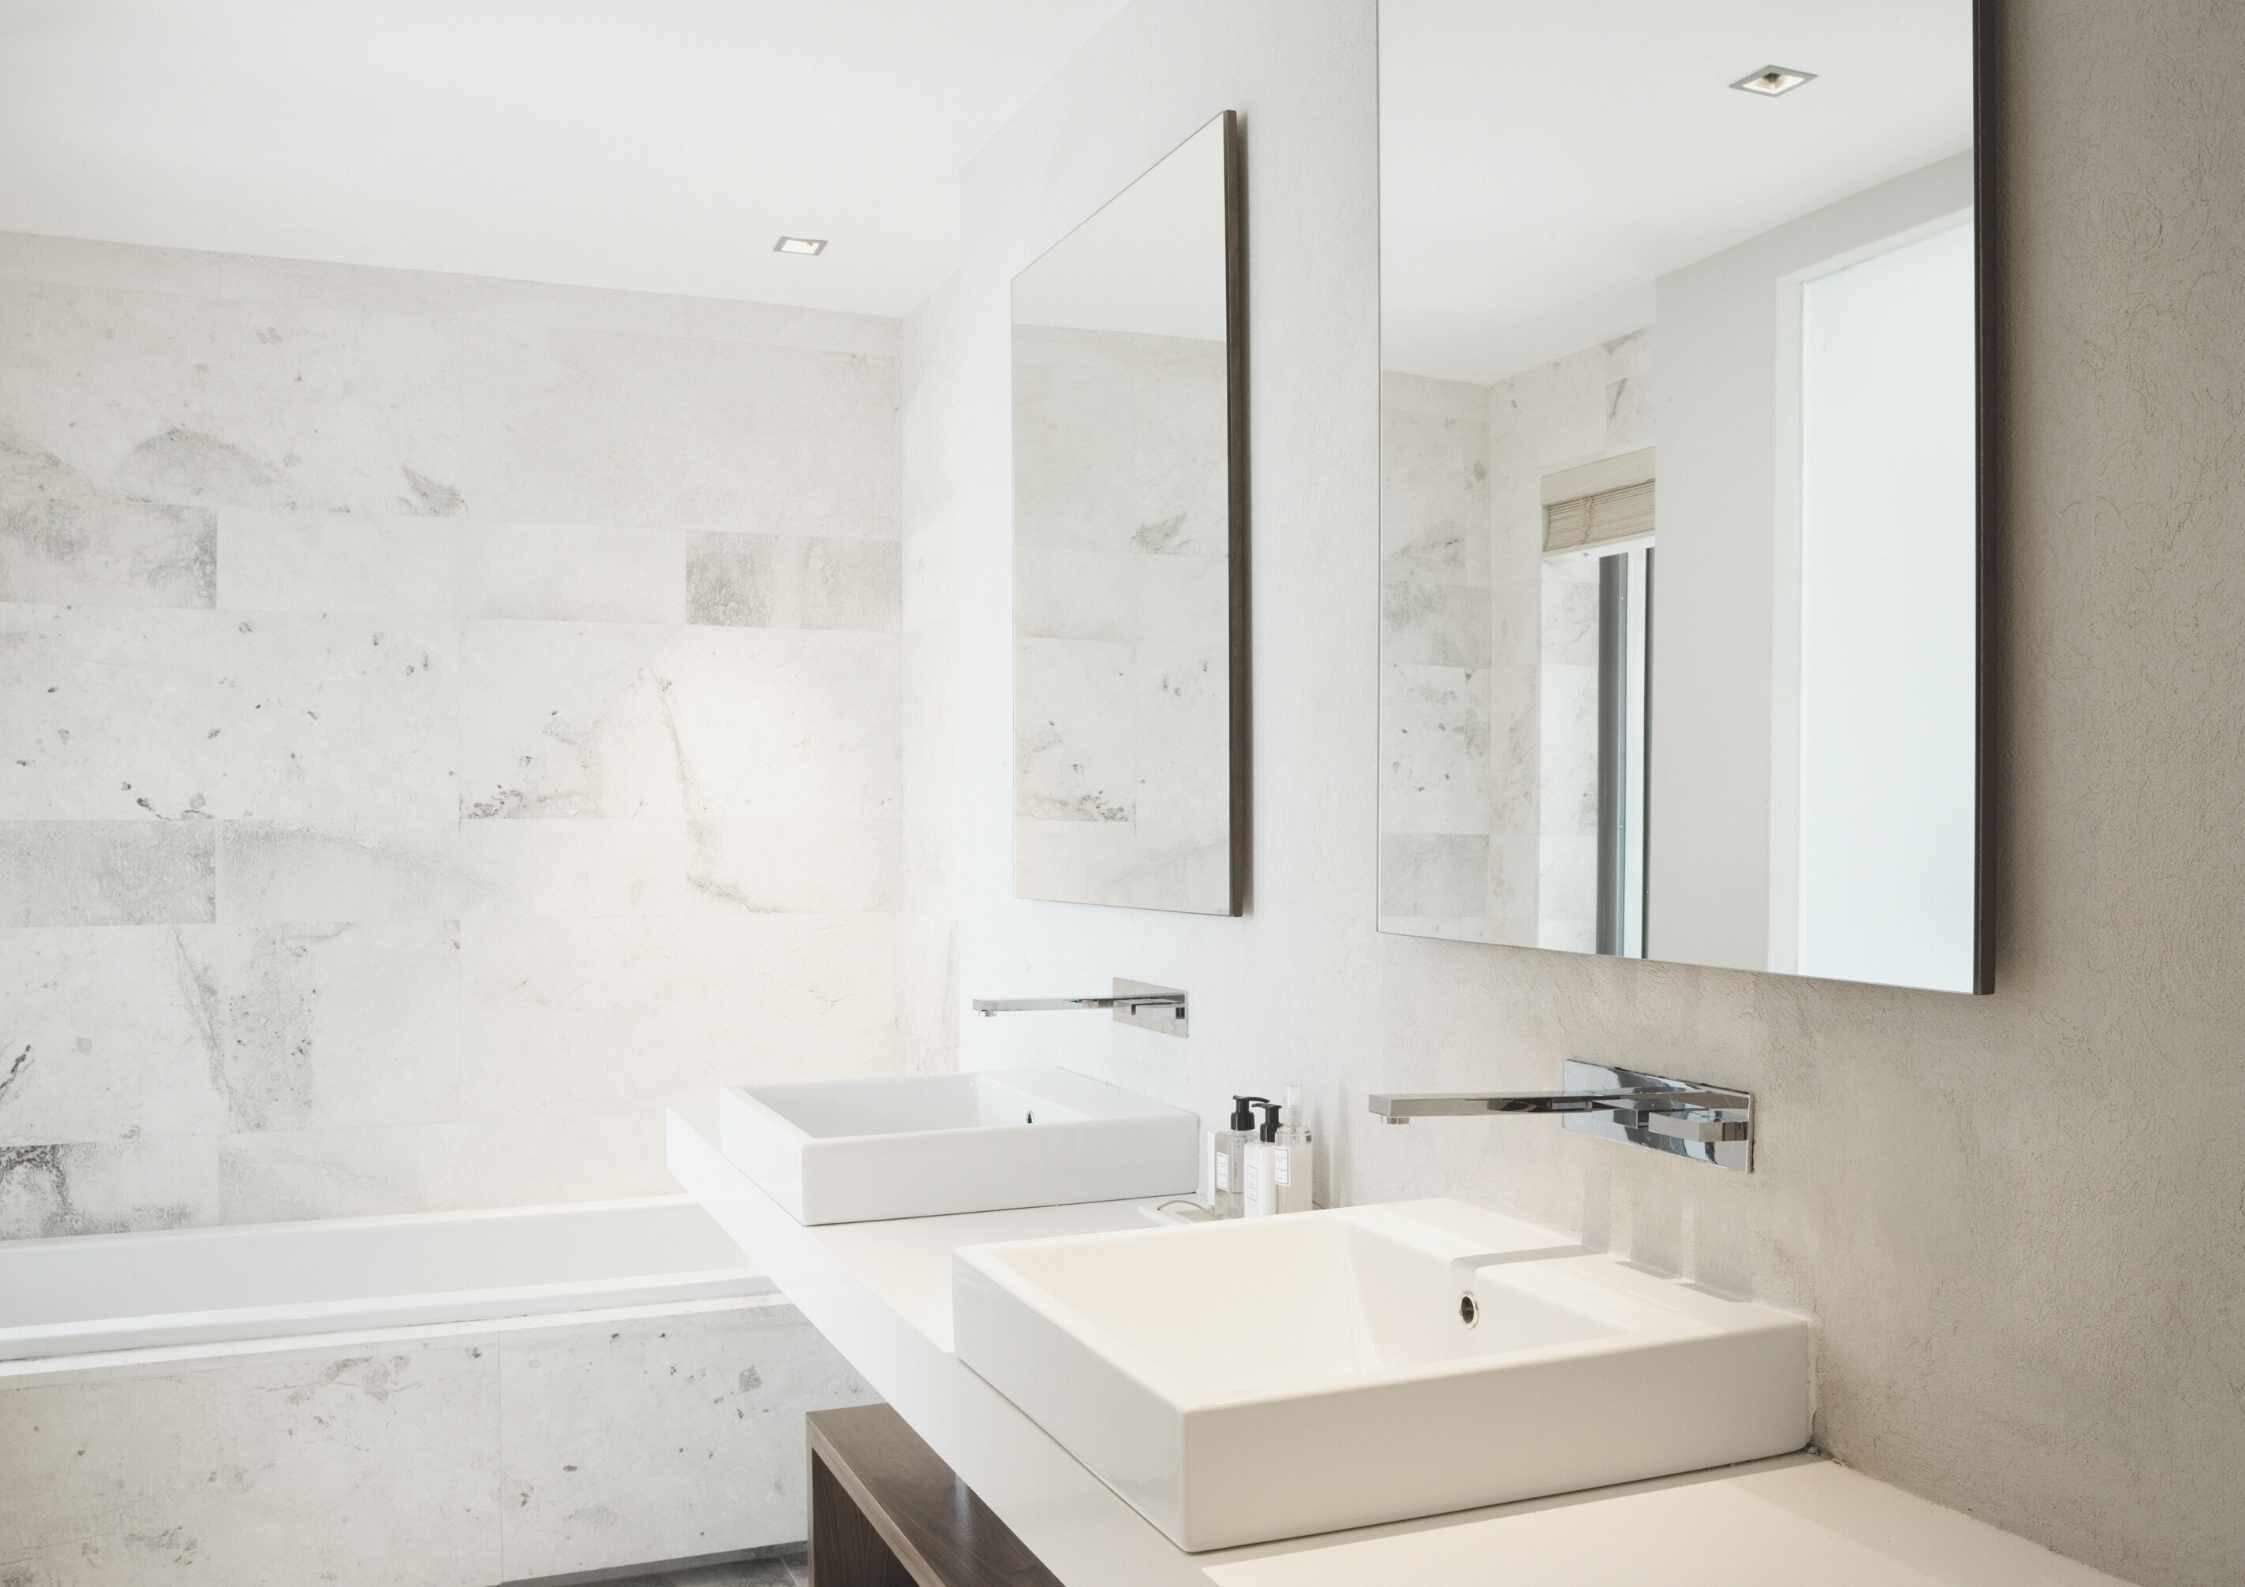 How Many Lumens Do I Need For A Bathroom Vanity Light Wild Creative Project